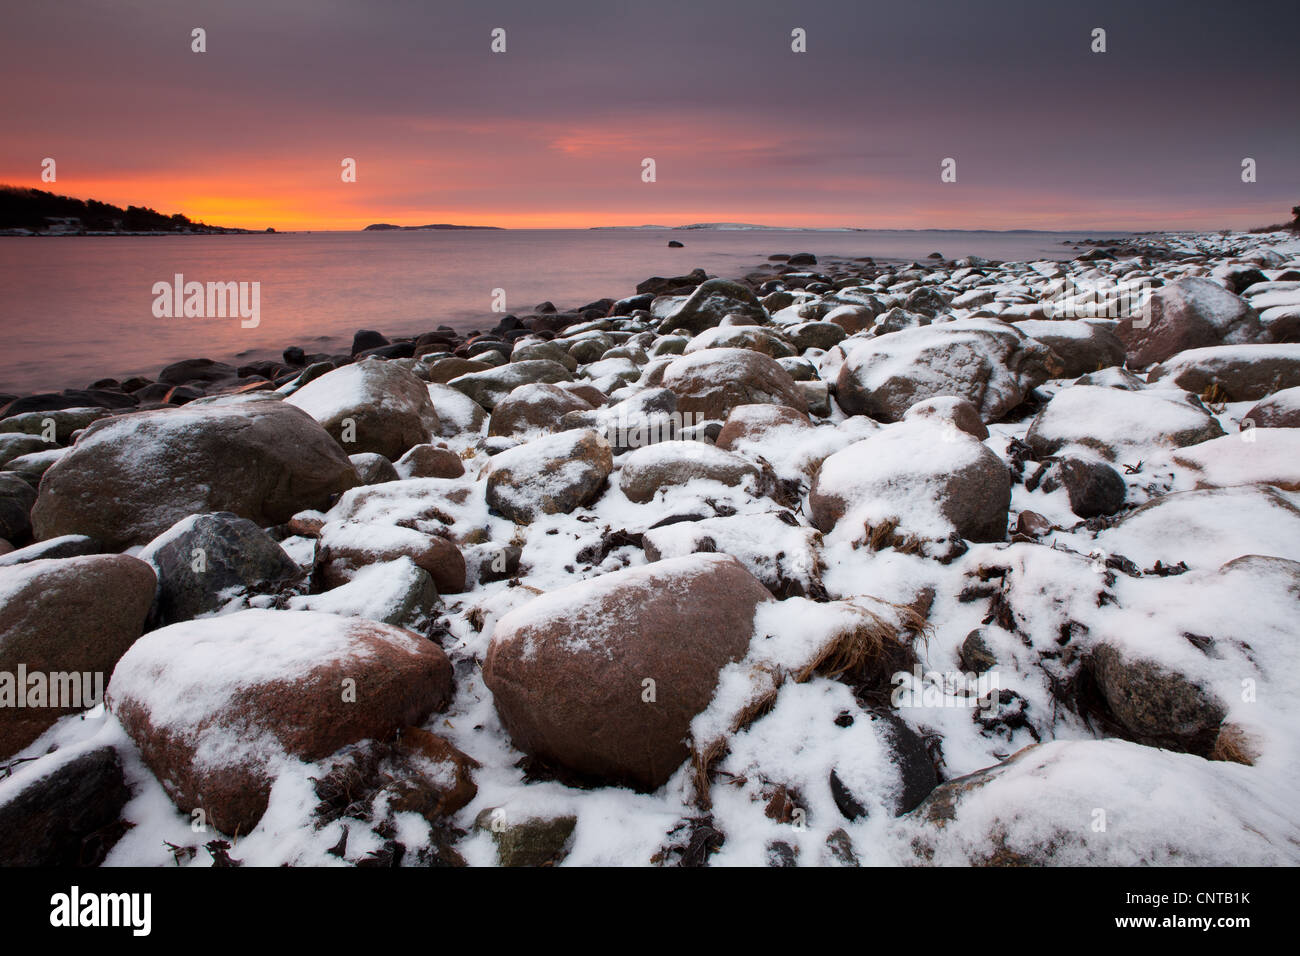 Daybreak at Larkollen in Rygge, Østfold fylke, Norway. - Stock Image